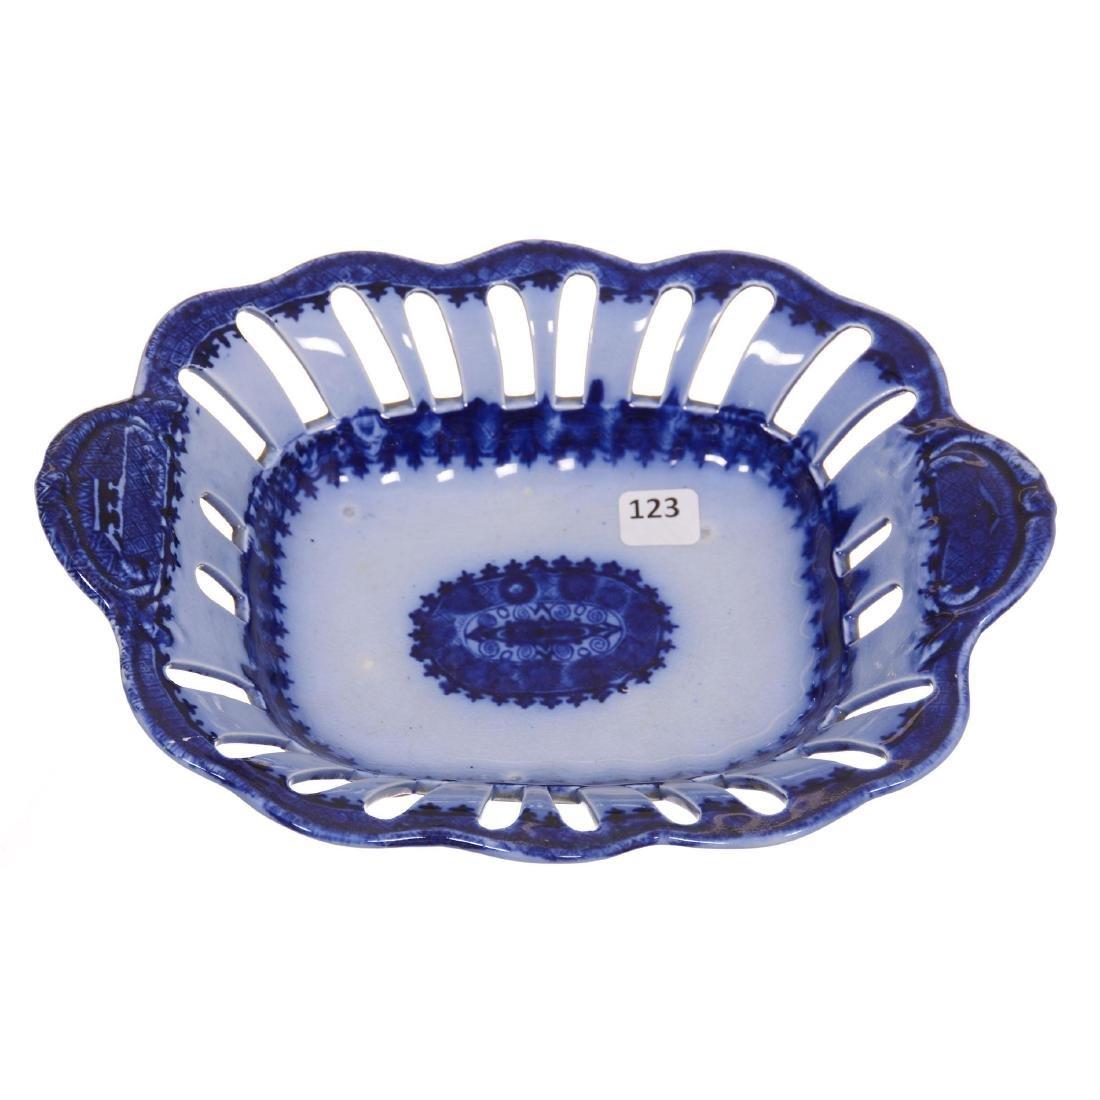 Flow Blue Pierced Bowl